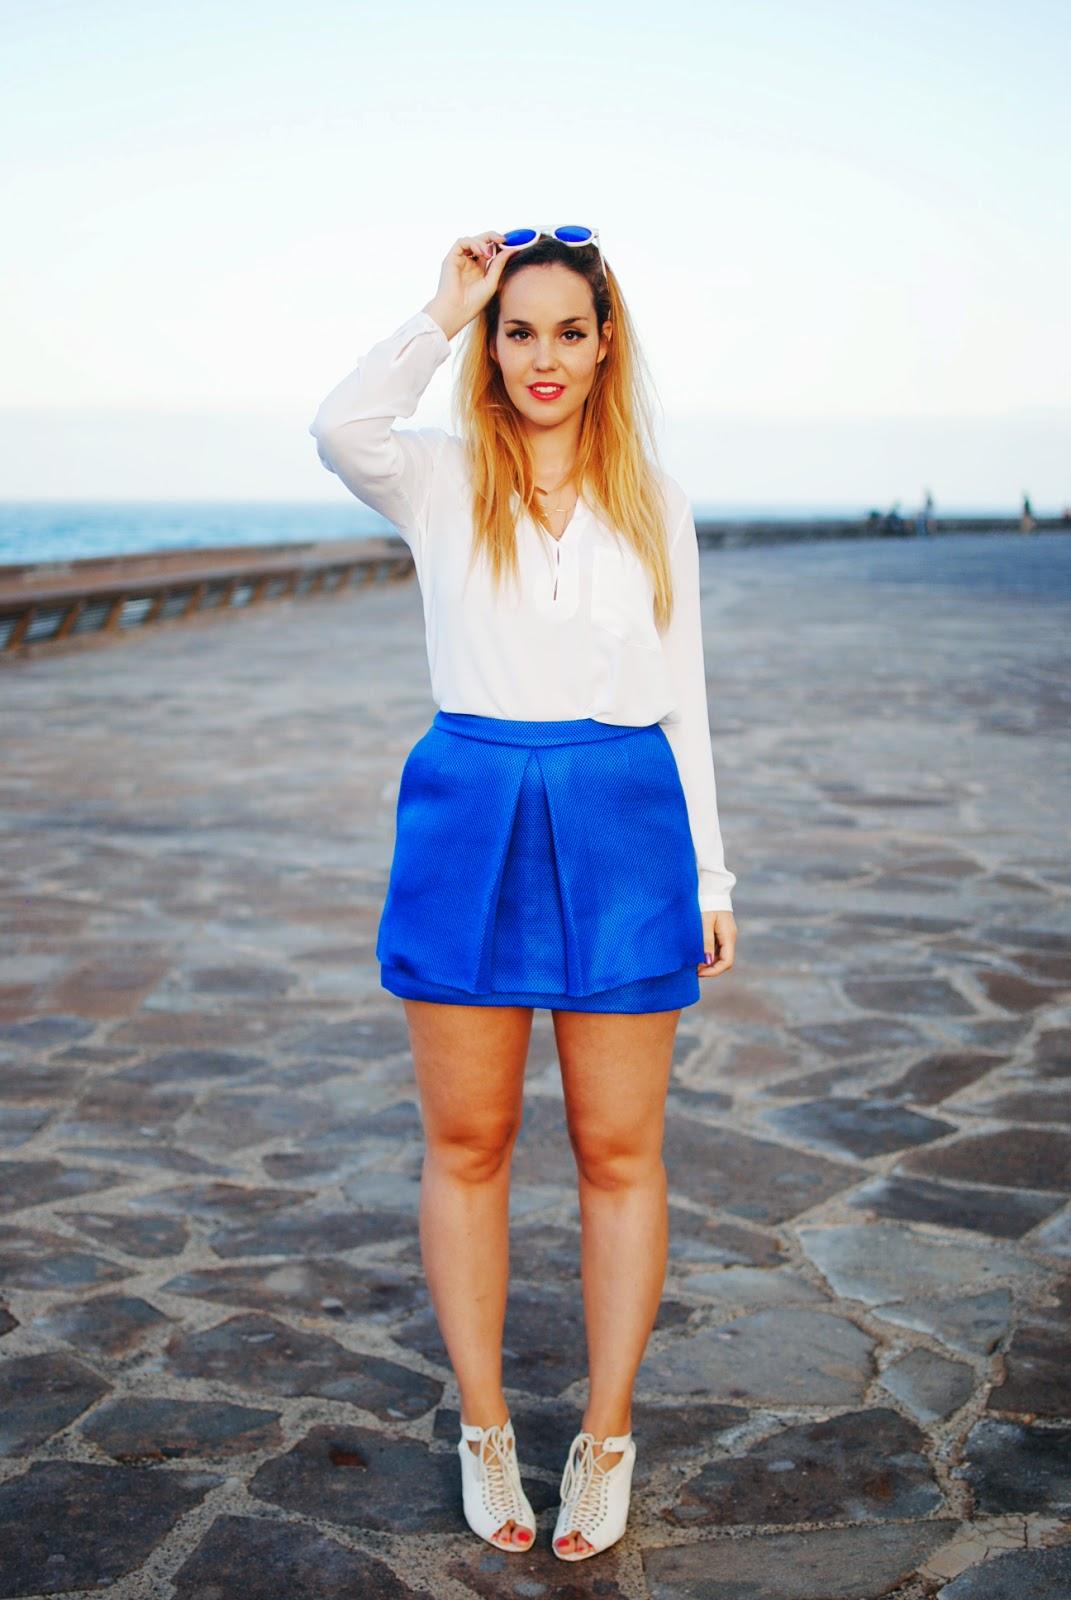 nery hdez, gafas de espejo, azul klein, blonde, neopreno , peplum skirt